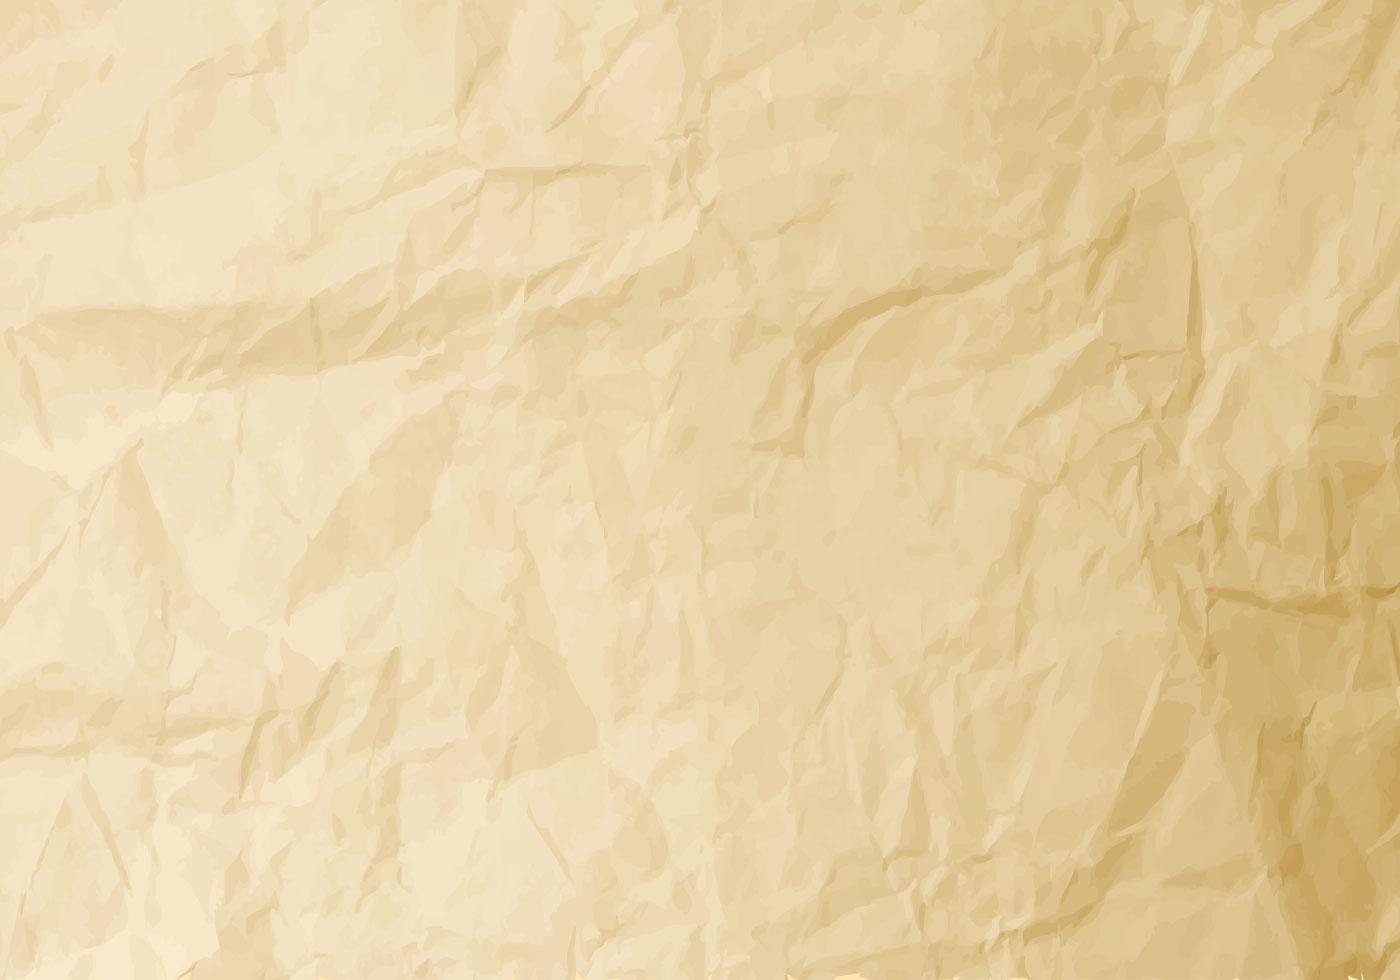 kaki paper free vector art